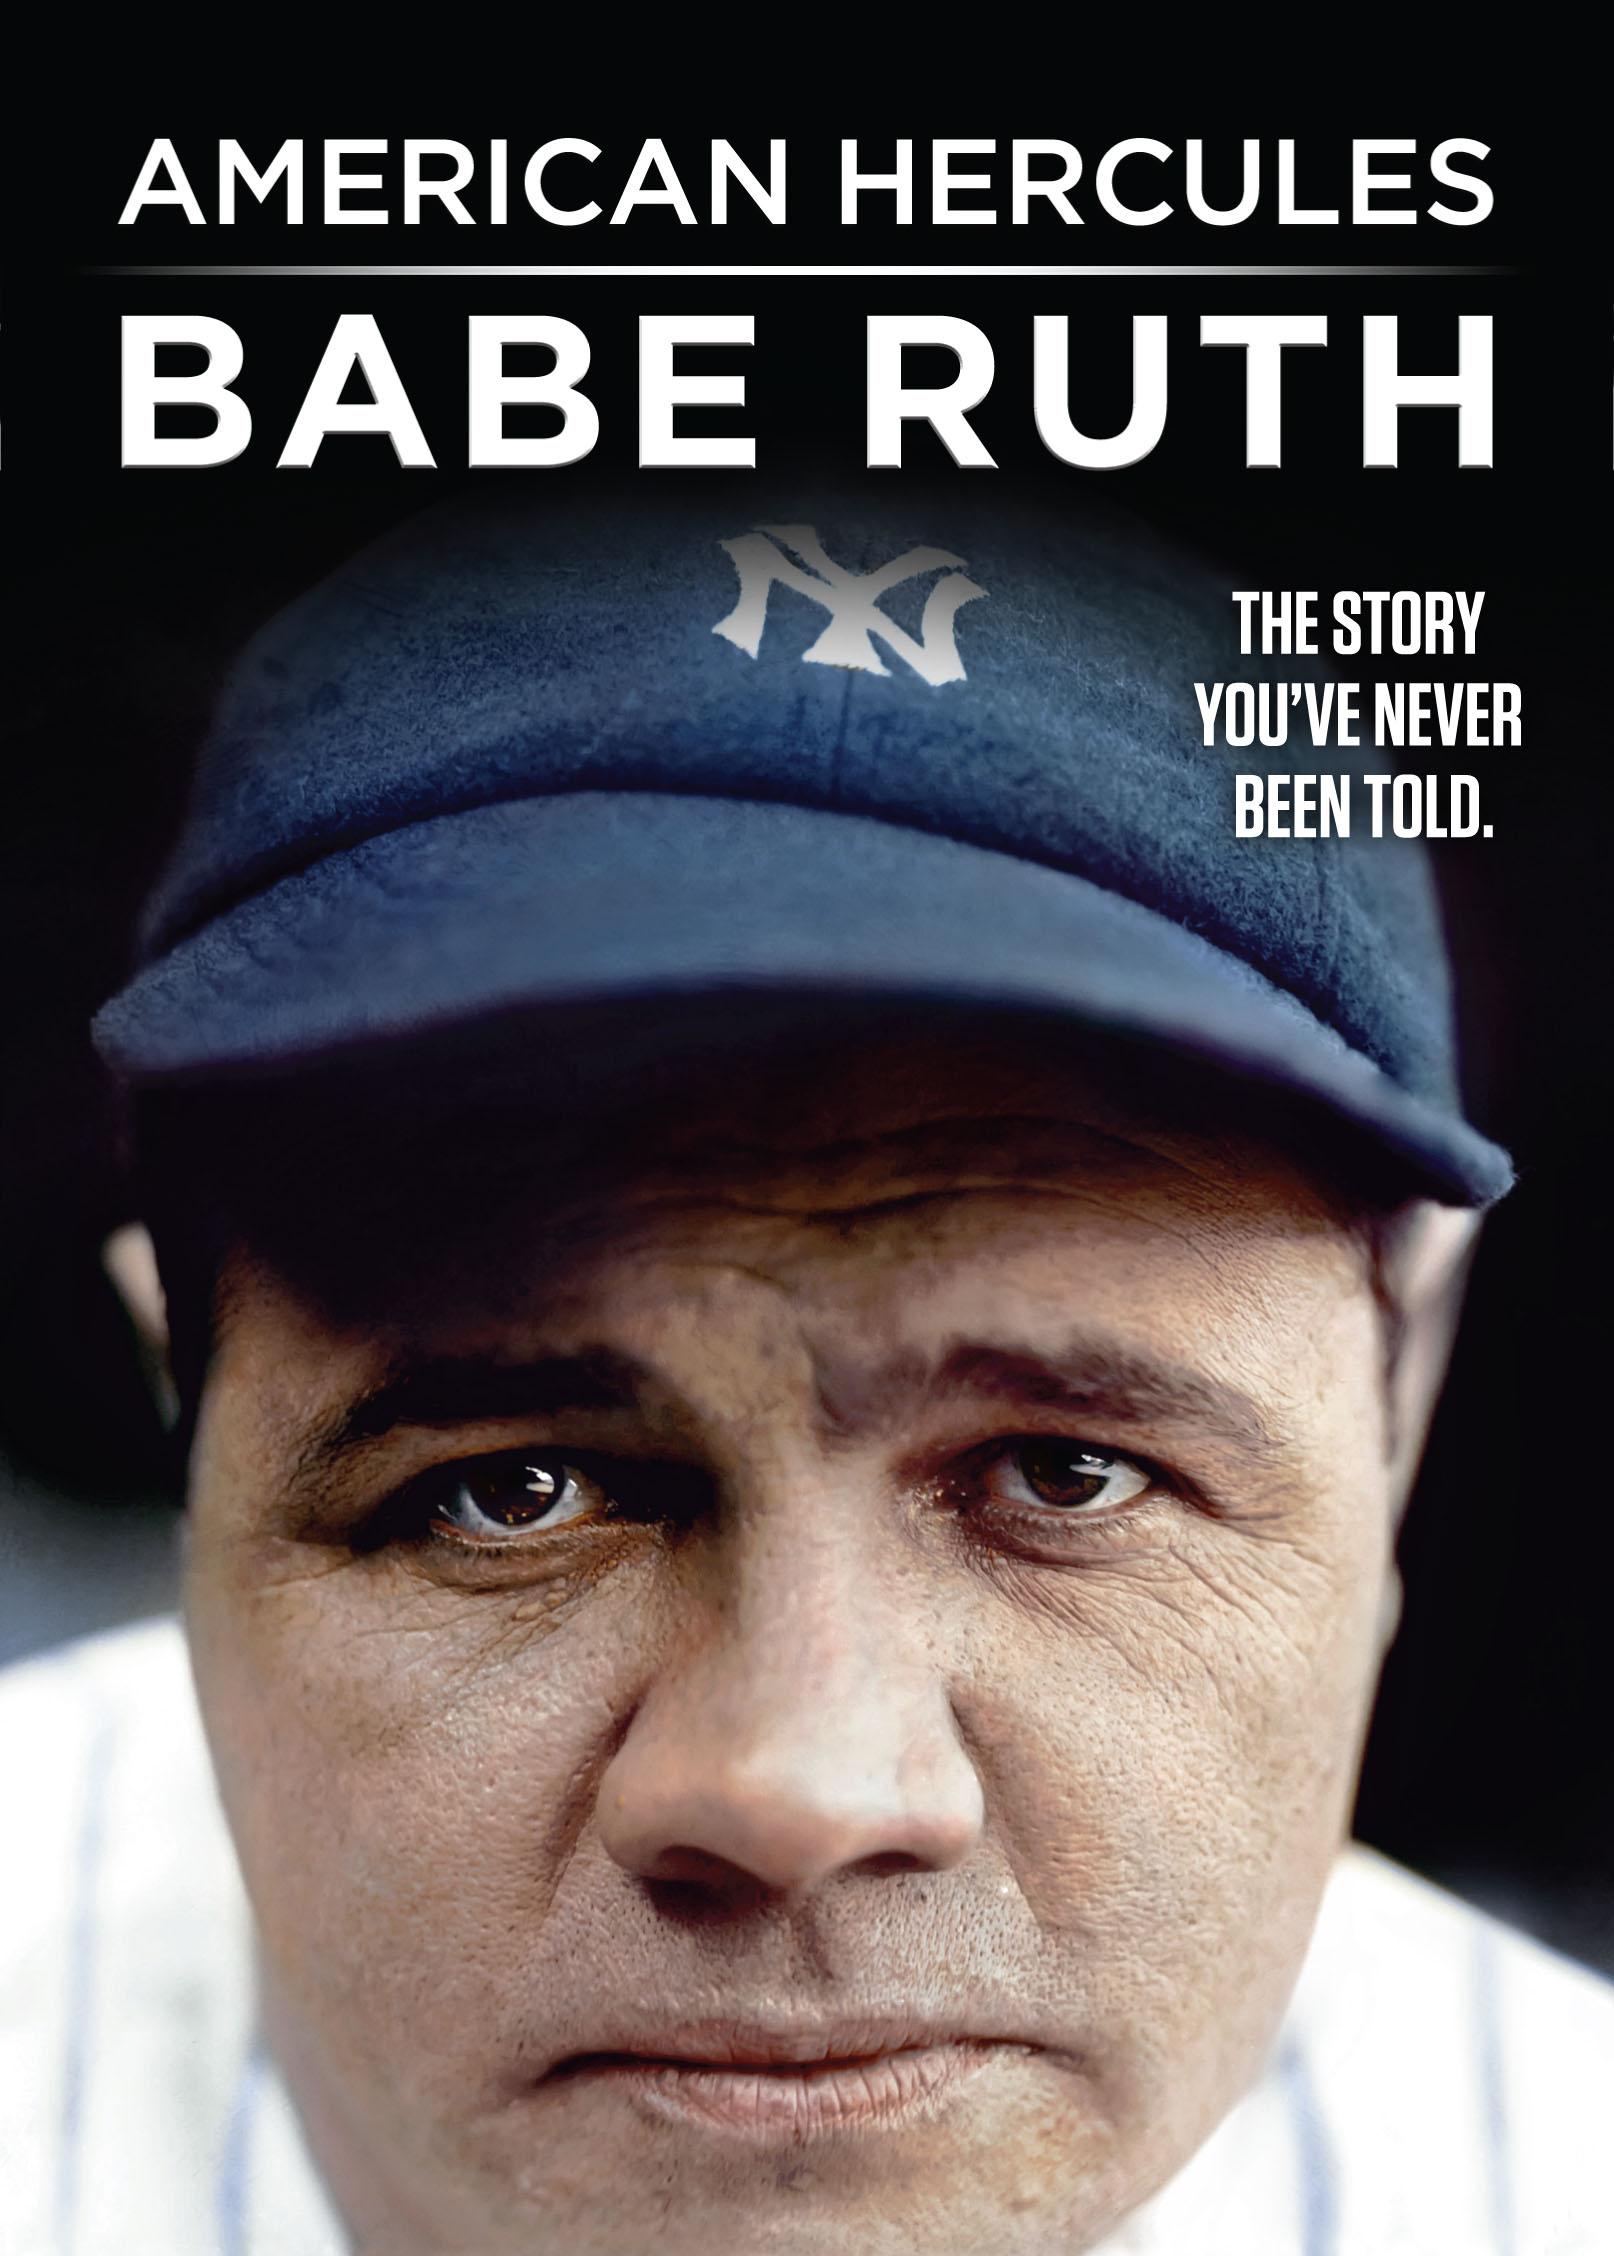 American Hercules: Babe Ruth